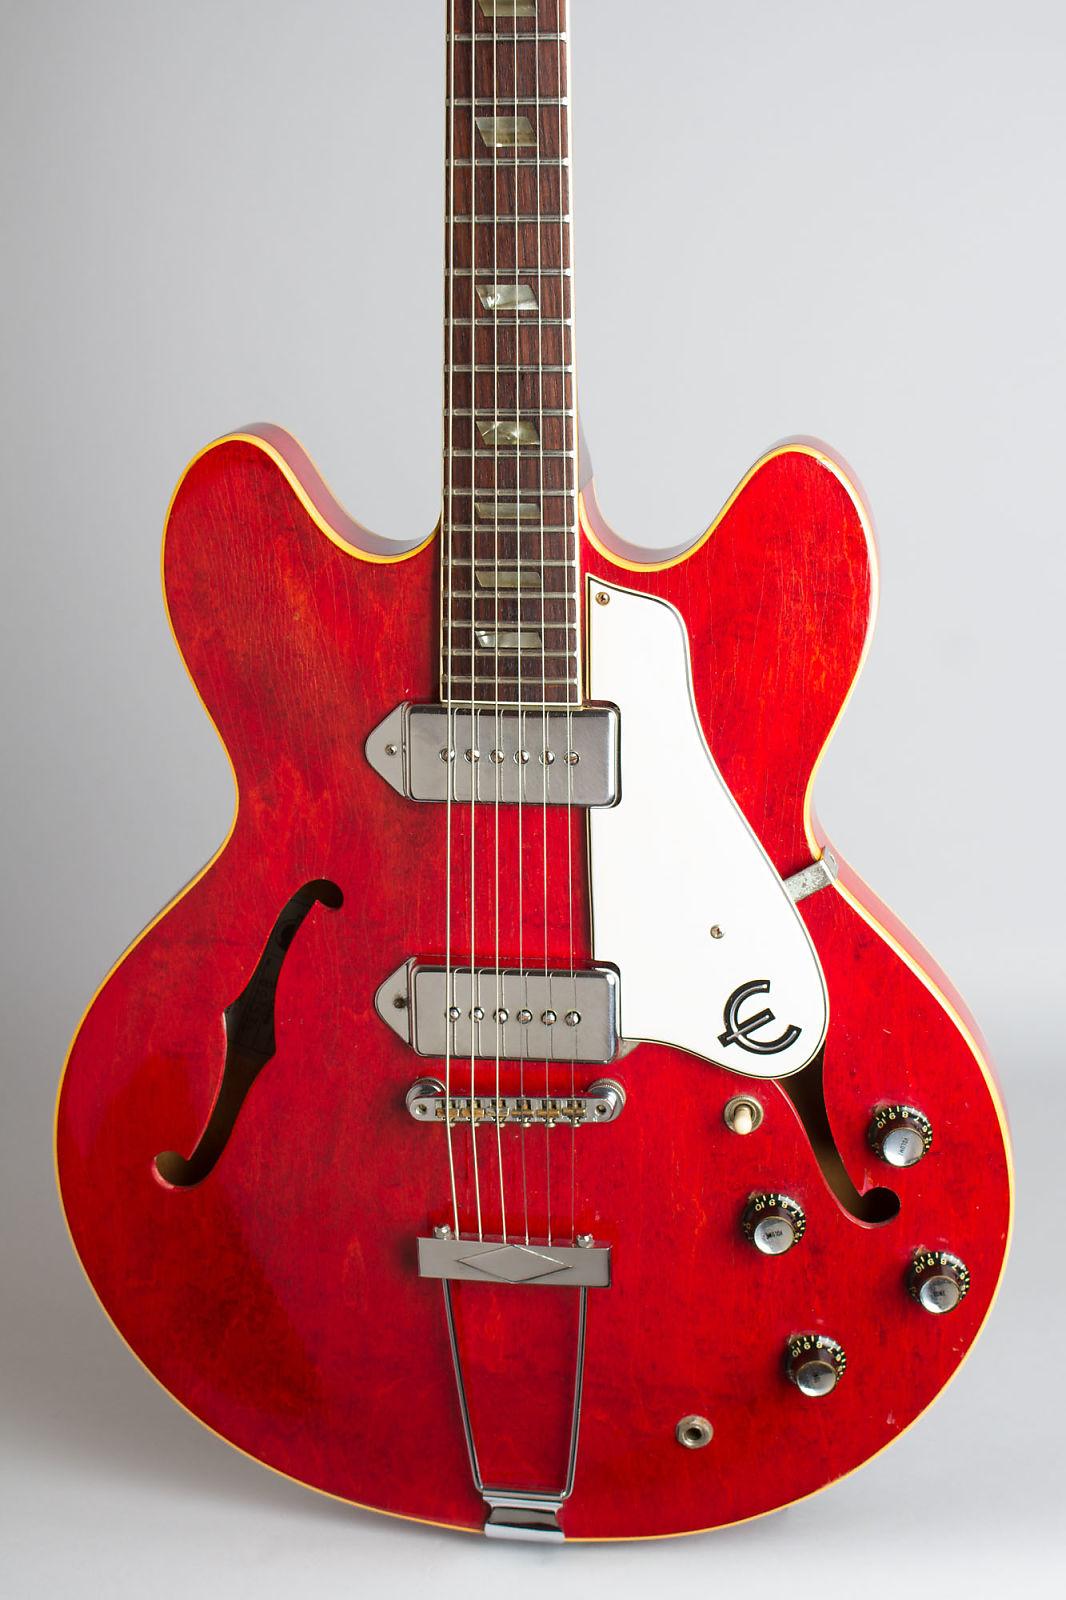 Epiphone  Casino E-230TDC Thinline Hollow Body Electric Guitar (1967), ser. #893534, black hard shell case.